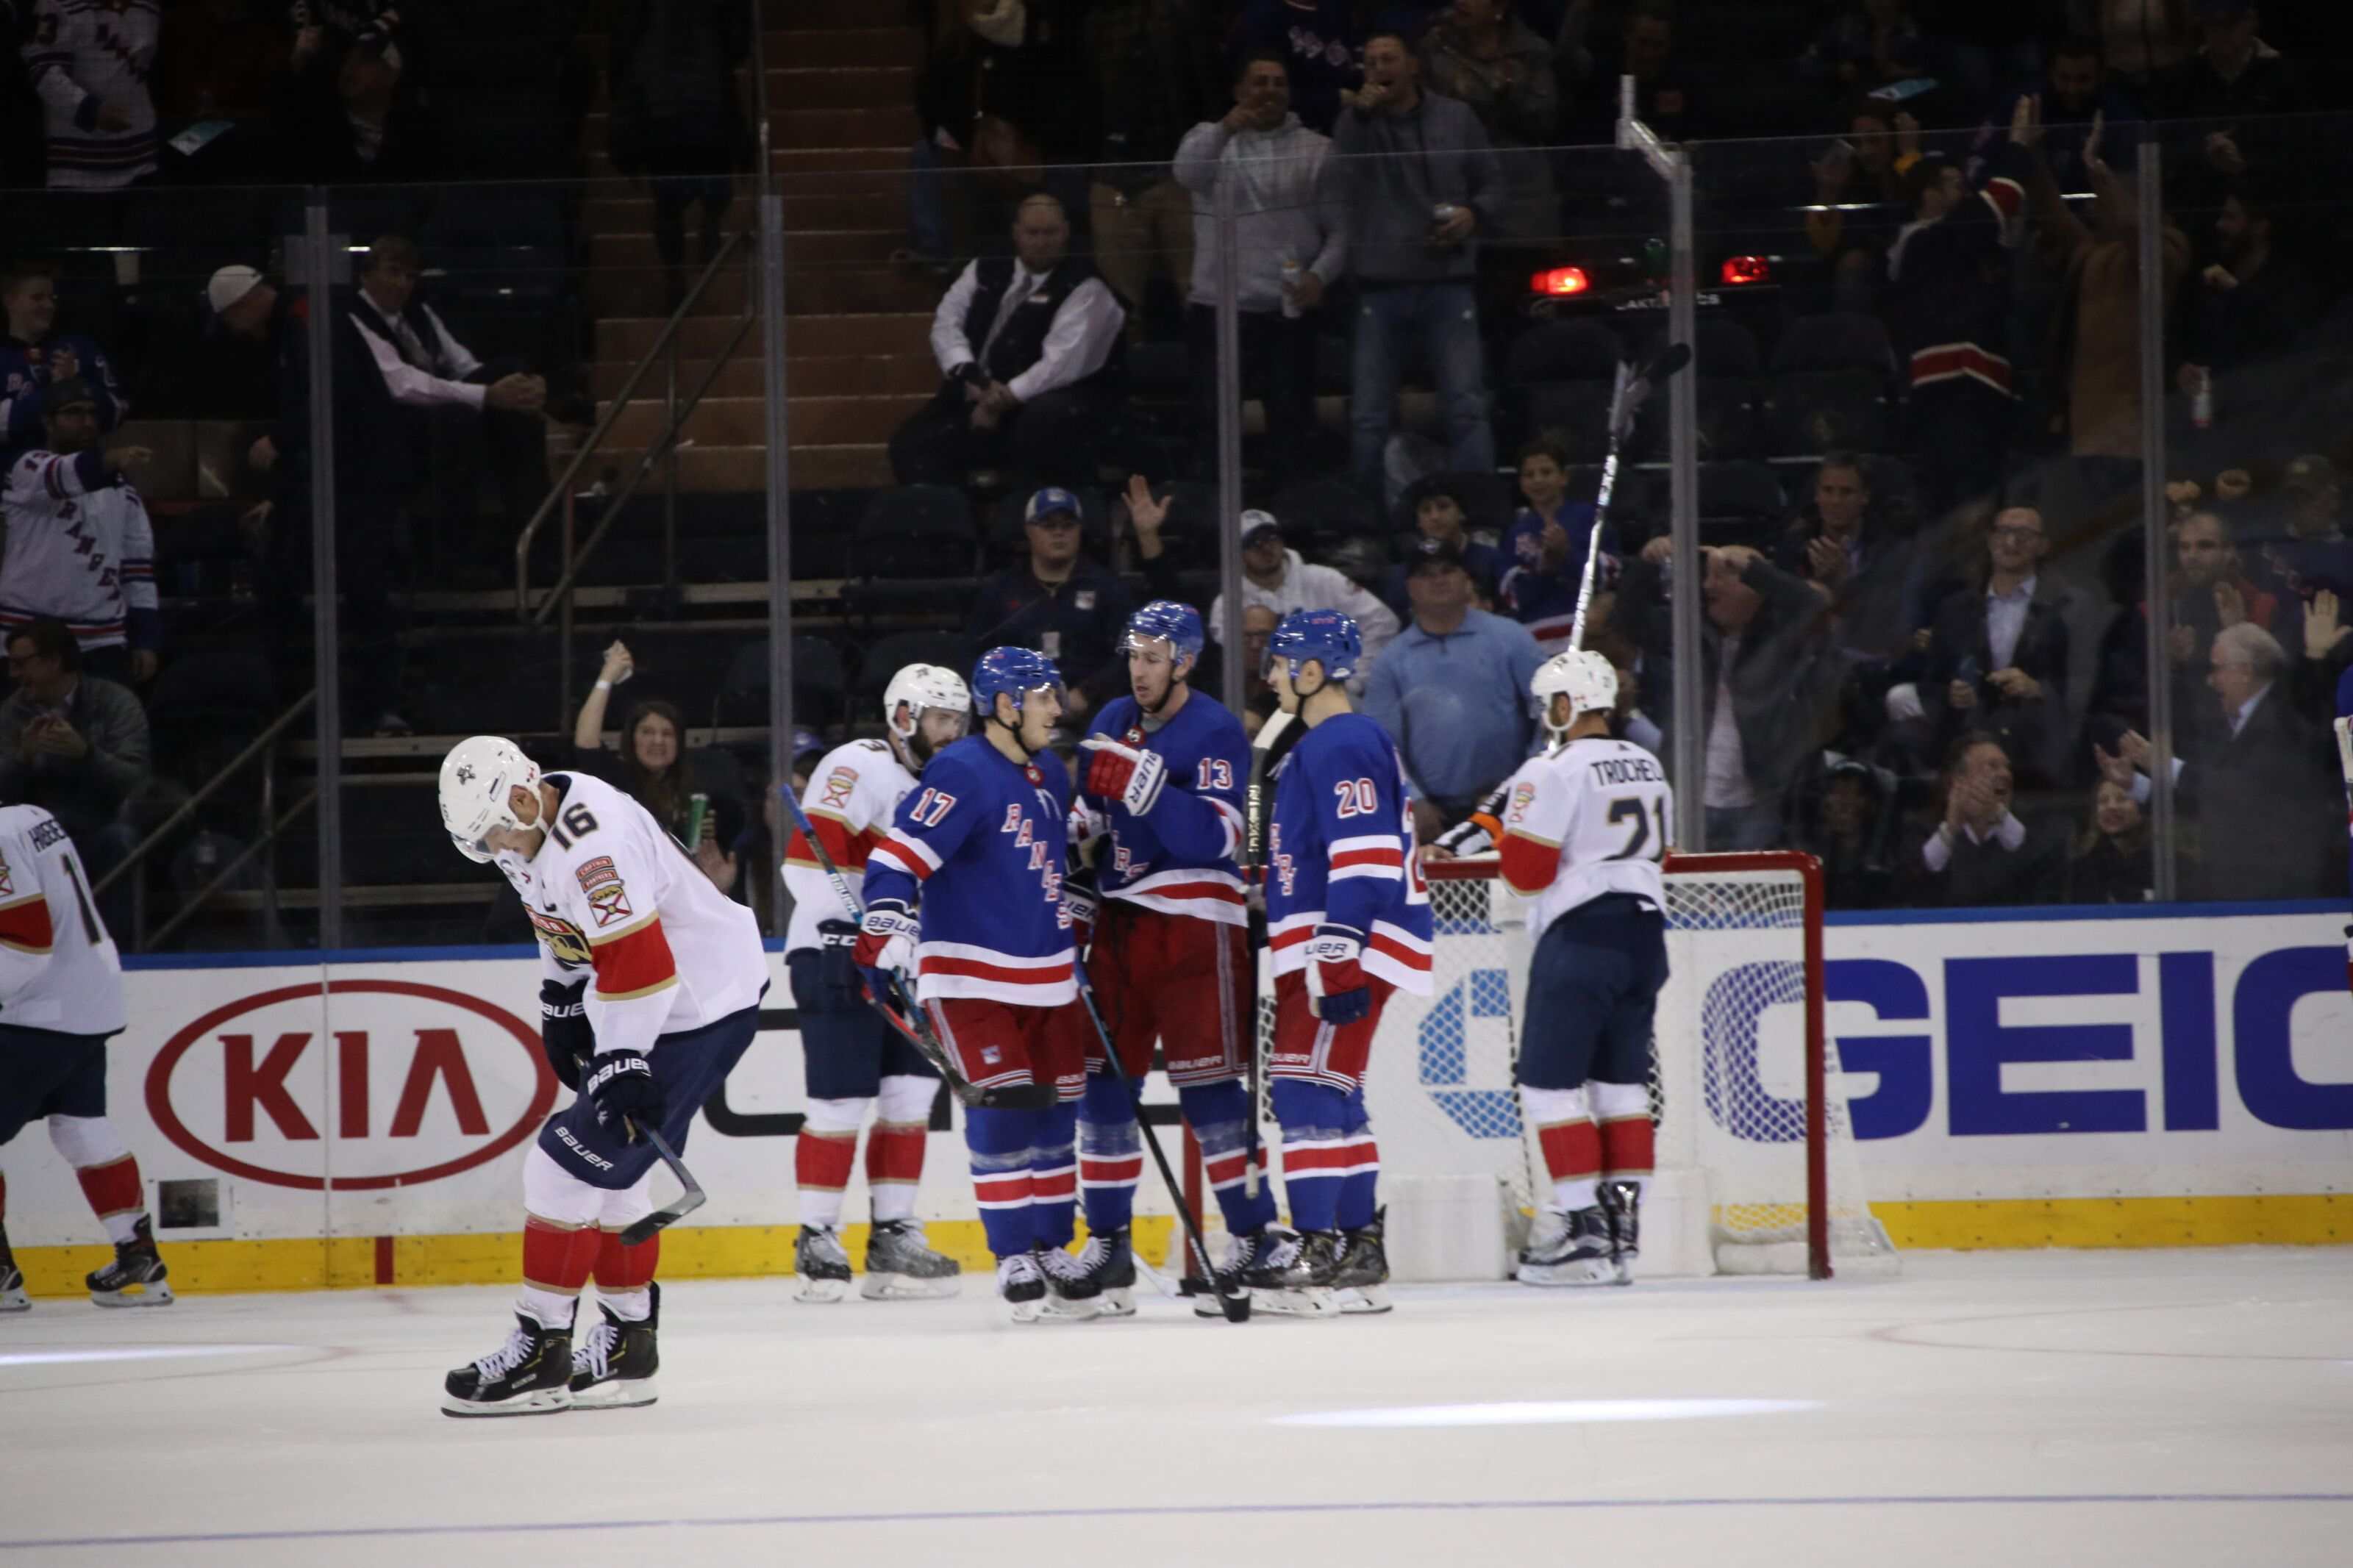 New York Rangers analysis: First regulation win, 5-2 over Florida